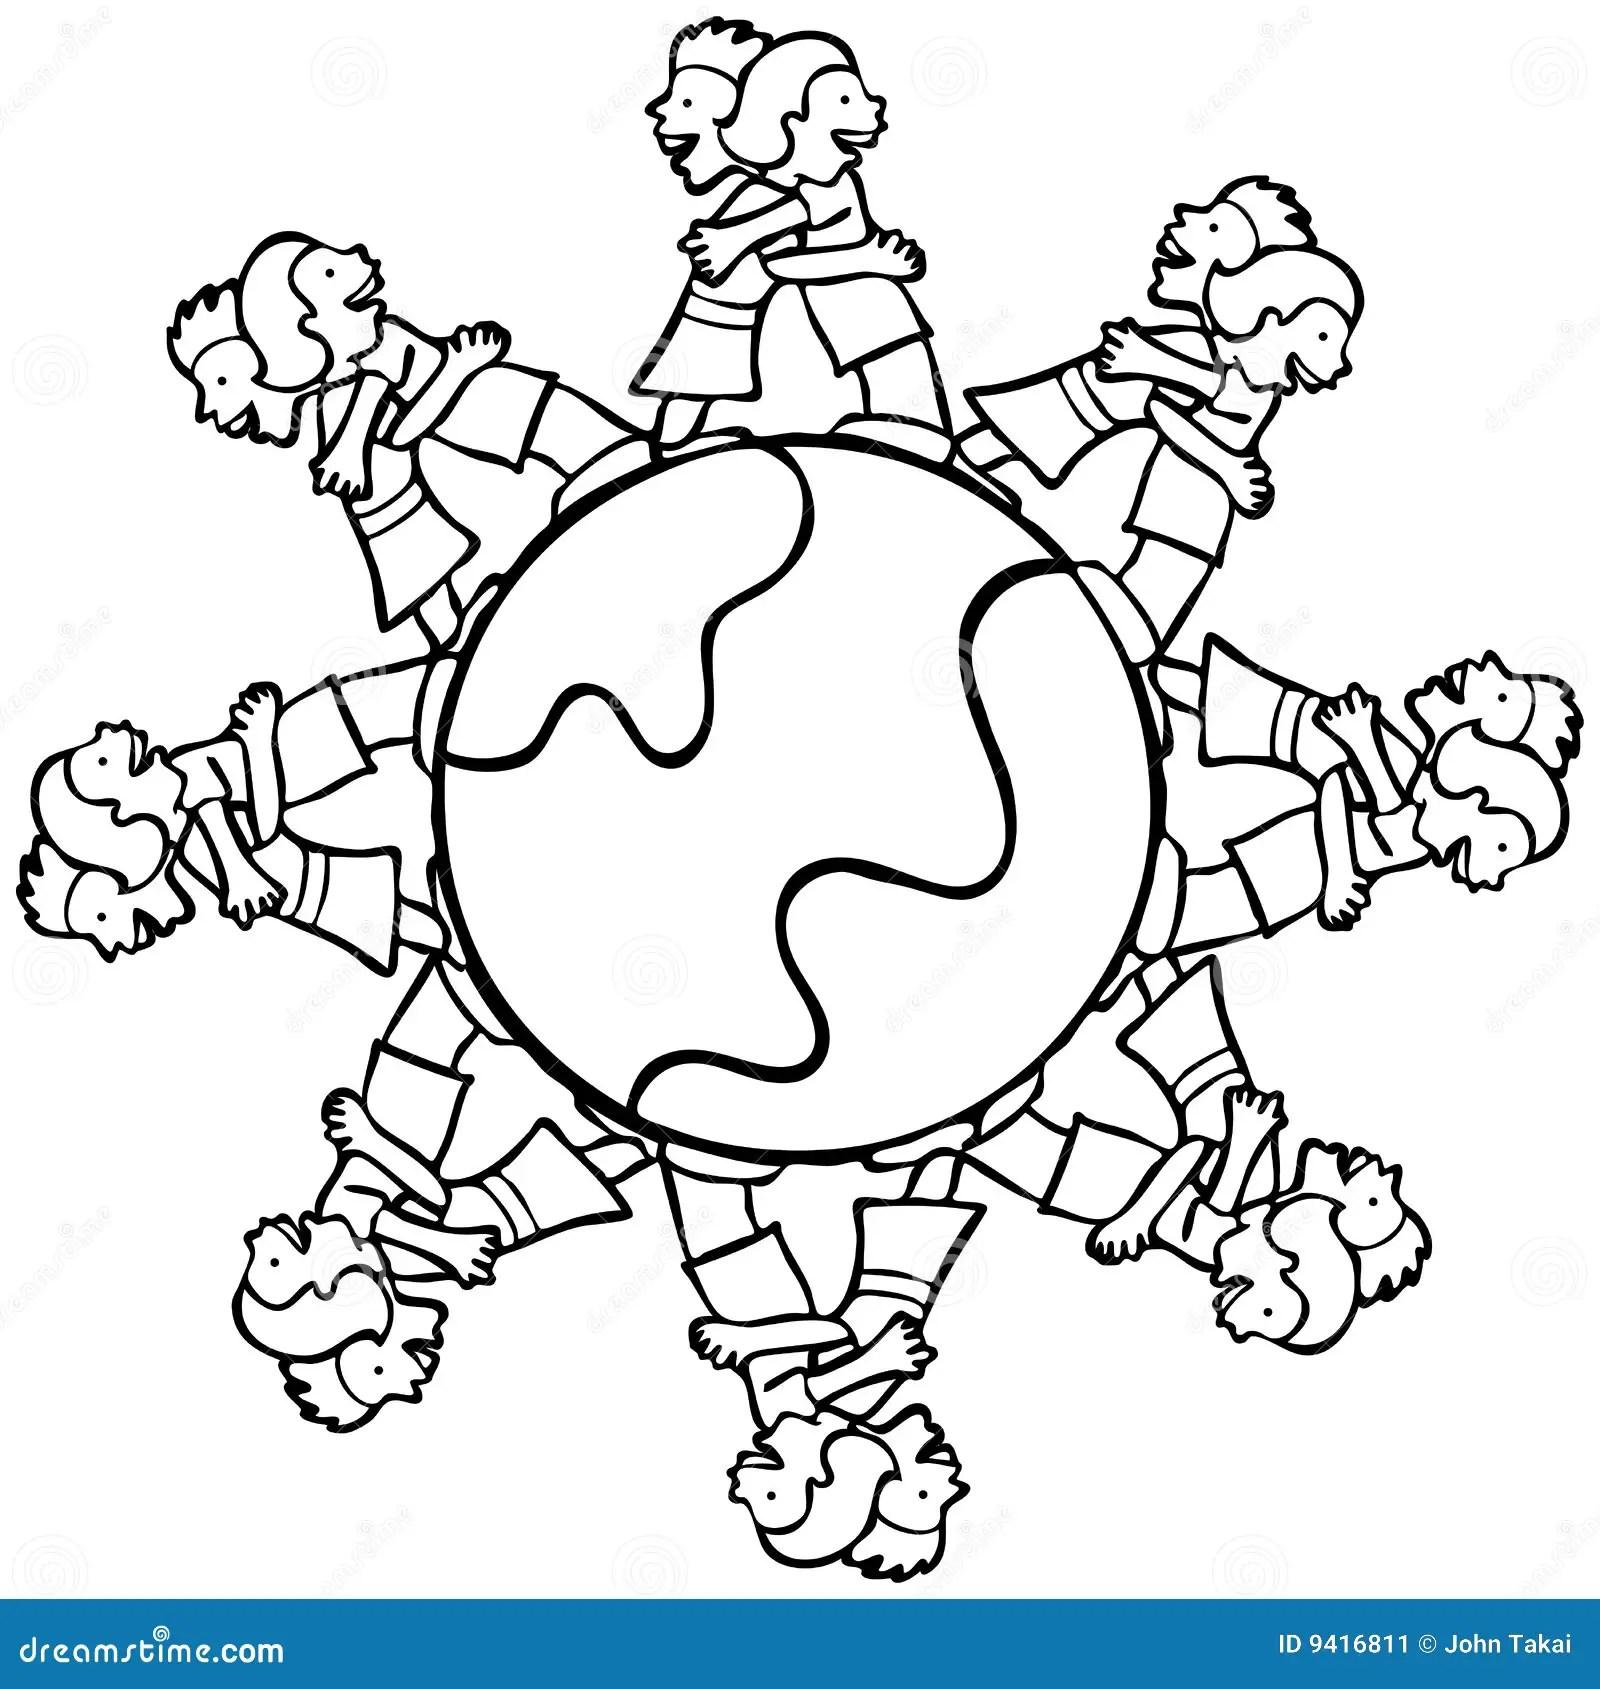 Globe With Surrounding Kids Hugging